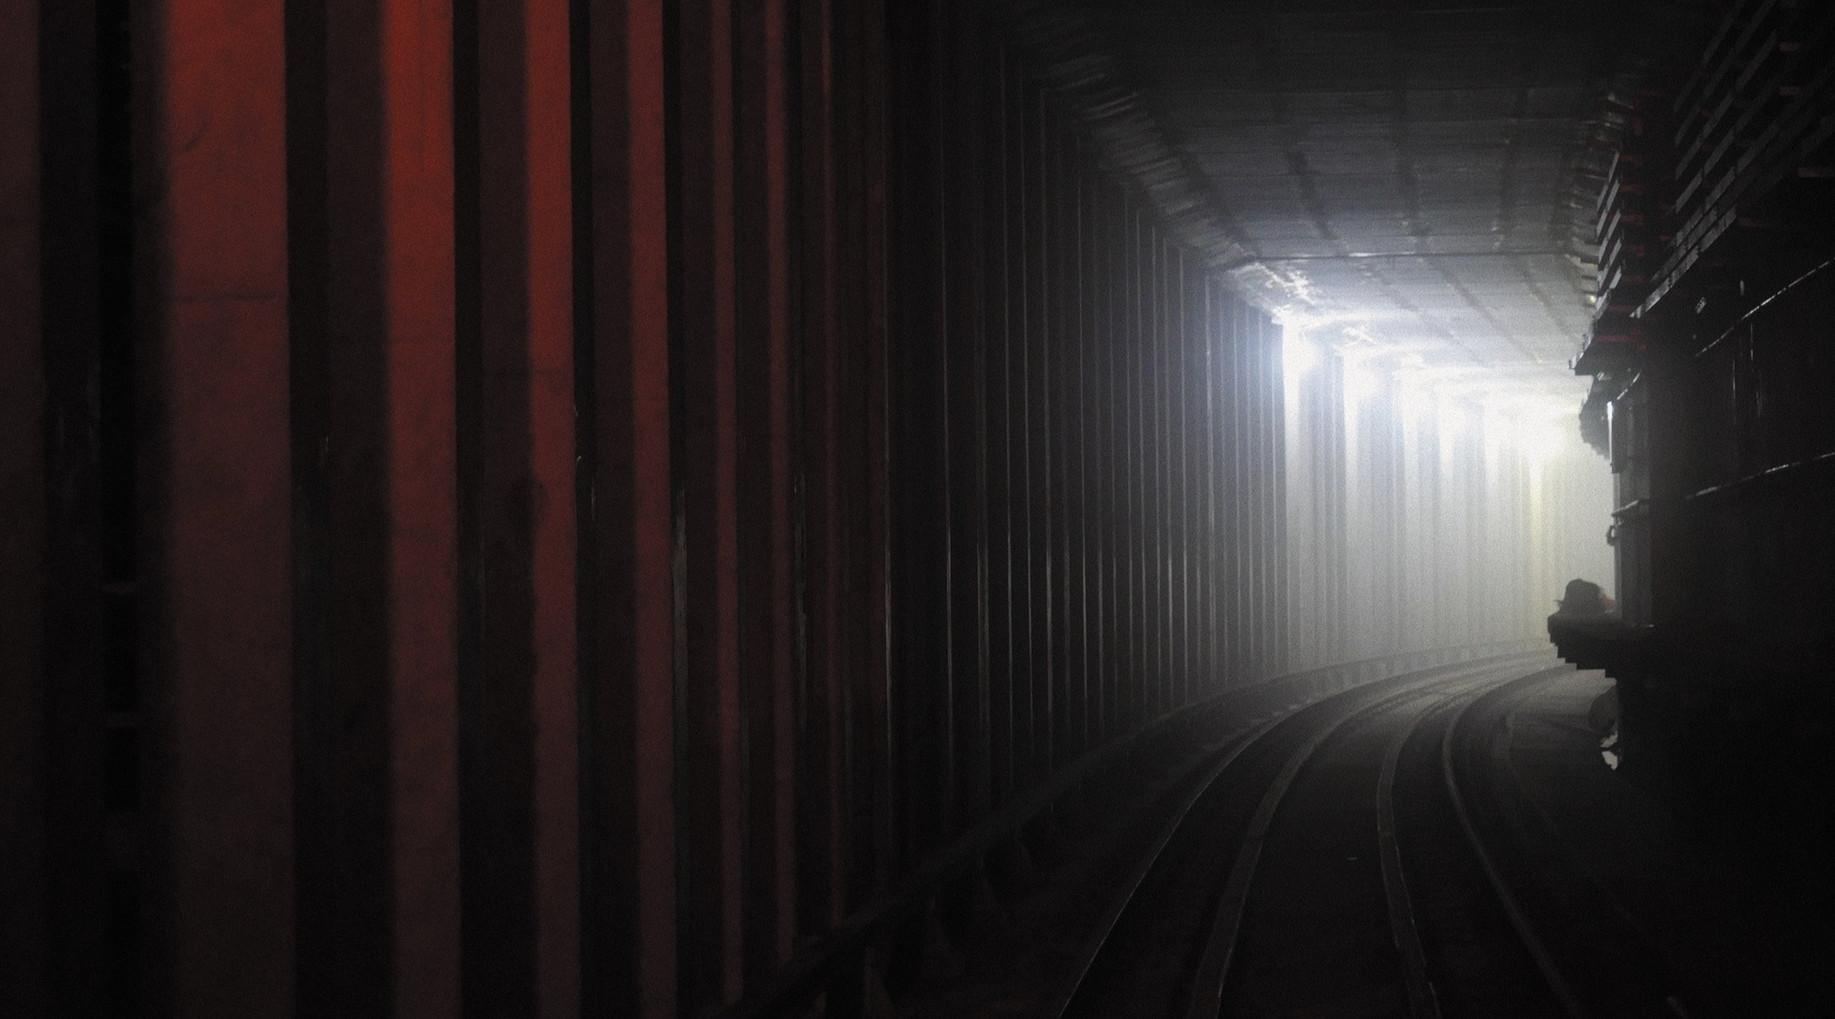 221-red-lines-tunnel_edited_edited.jpg